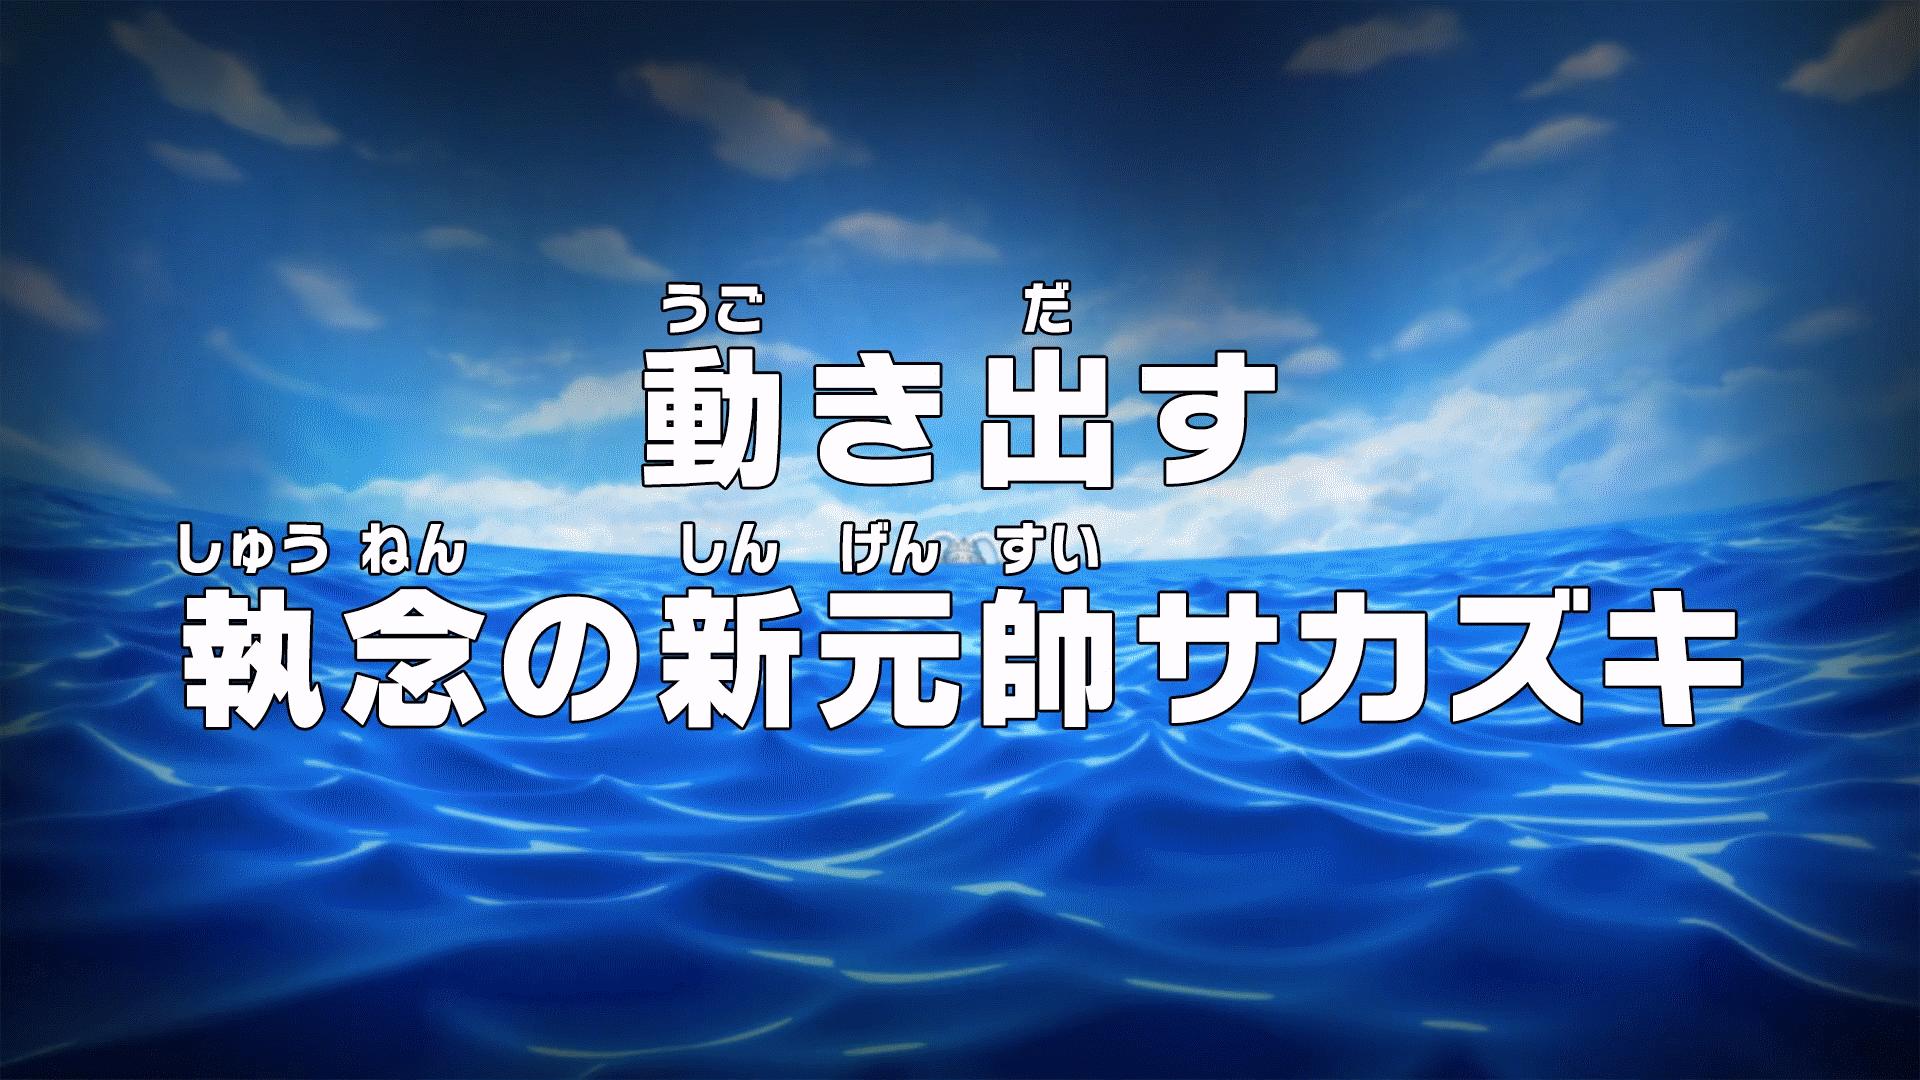 Episode 881